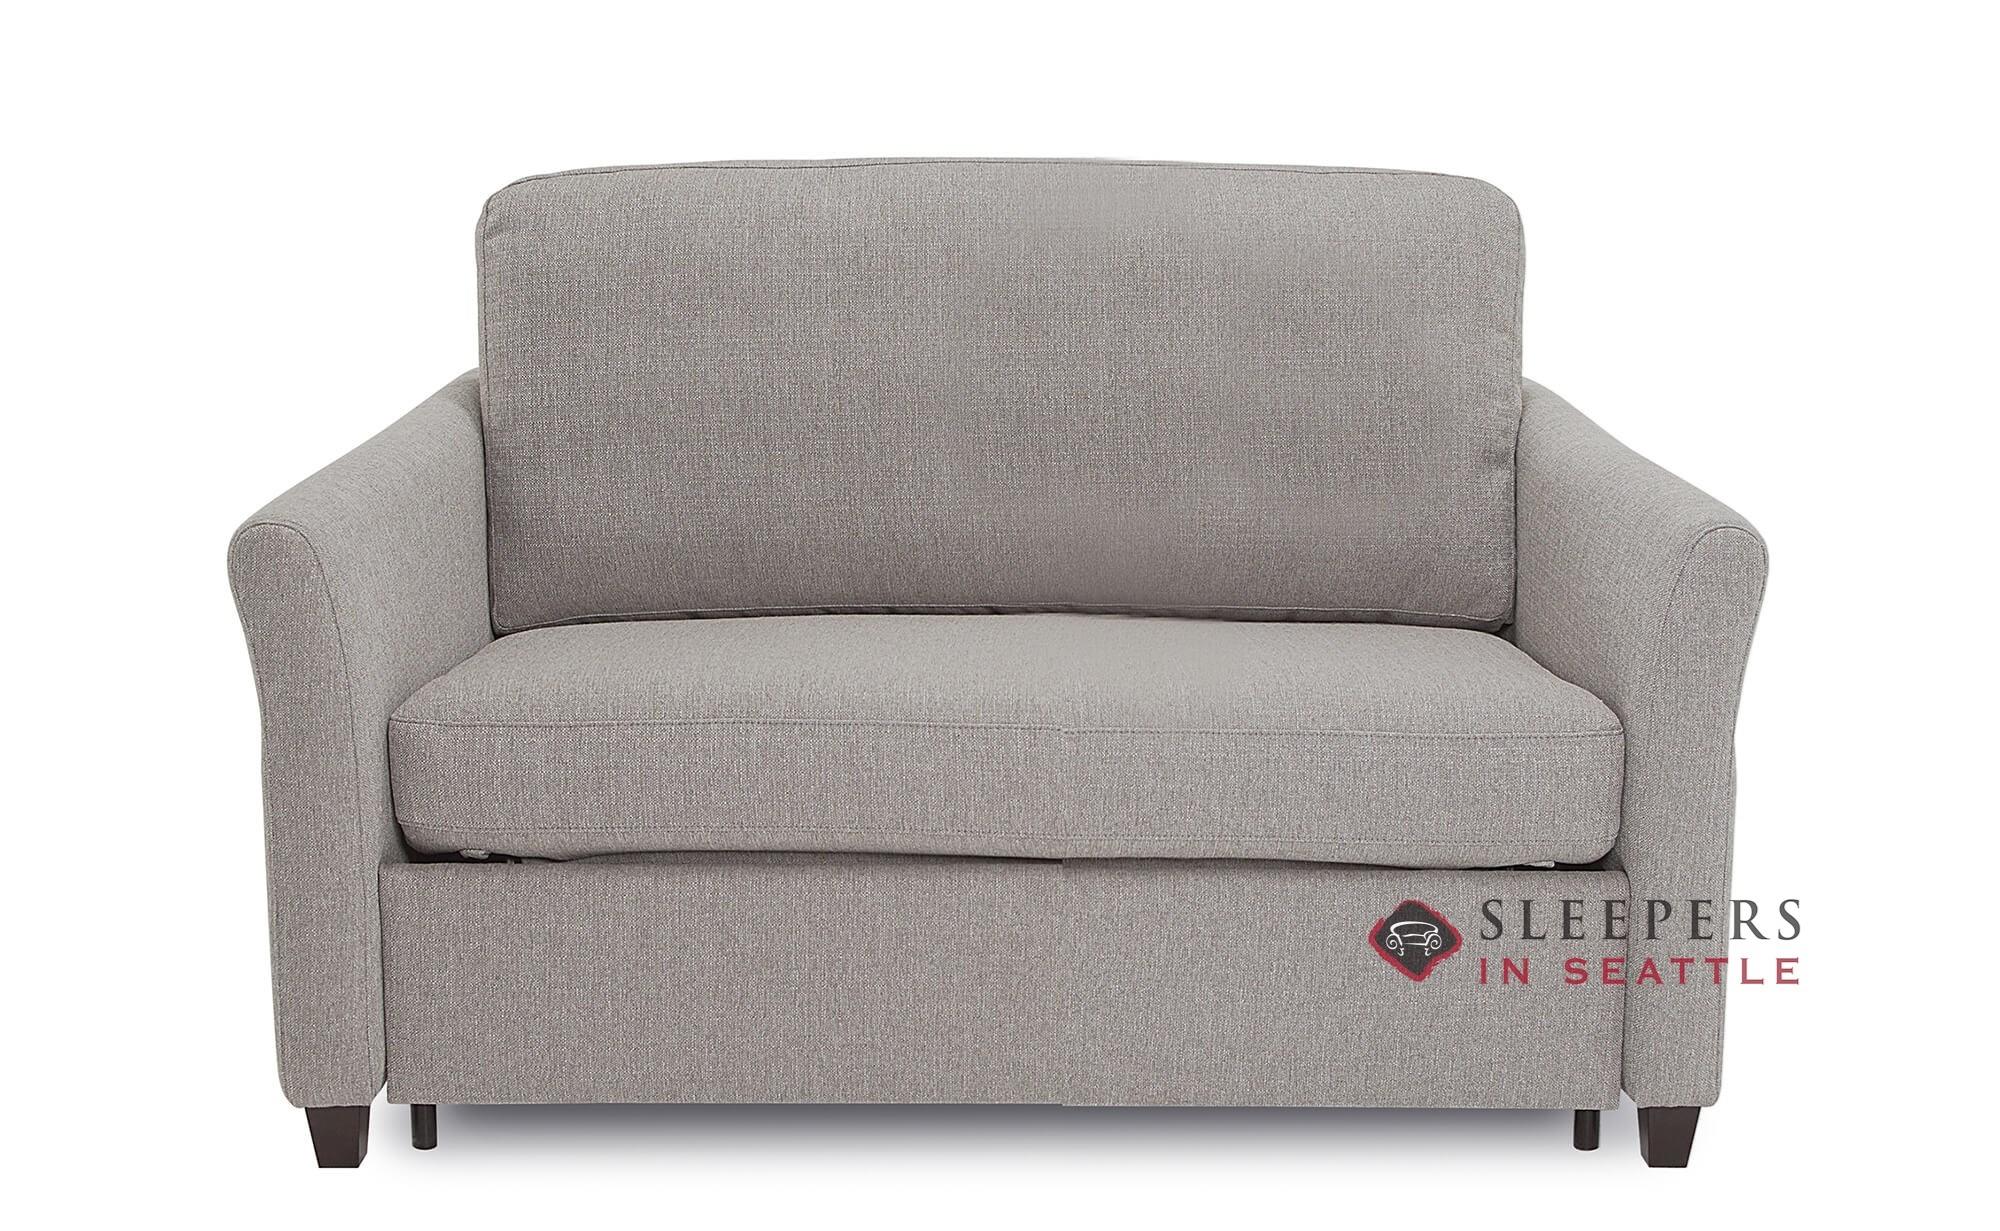 Astounding Palliser Madeline Cloudz Top Grain Leather Twin Sleeper Sofa Dailytribune Chair Design For Home Dailytribuneorg